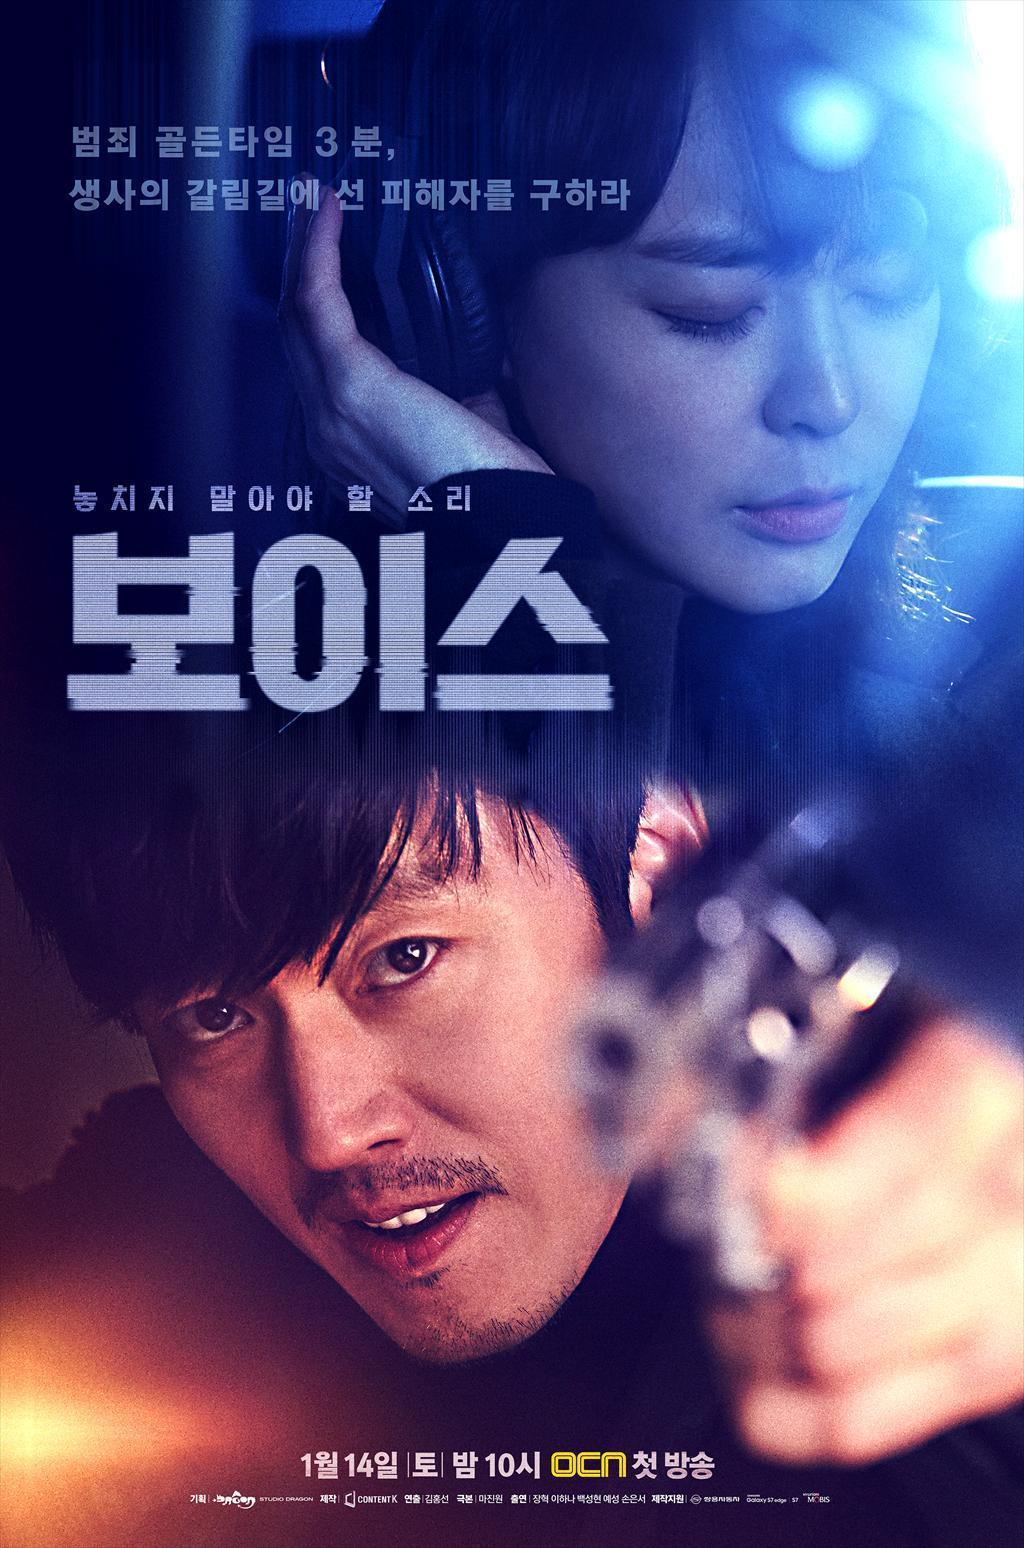 [韓劇] Voice (보이스) (2017) ZNDVV3RZSWUKHLHS8ALY_1024x0